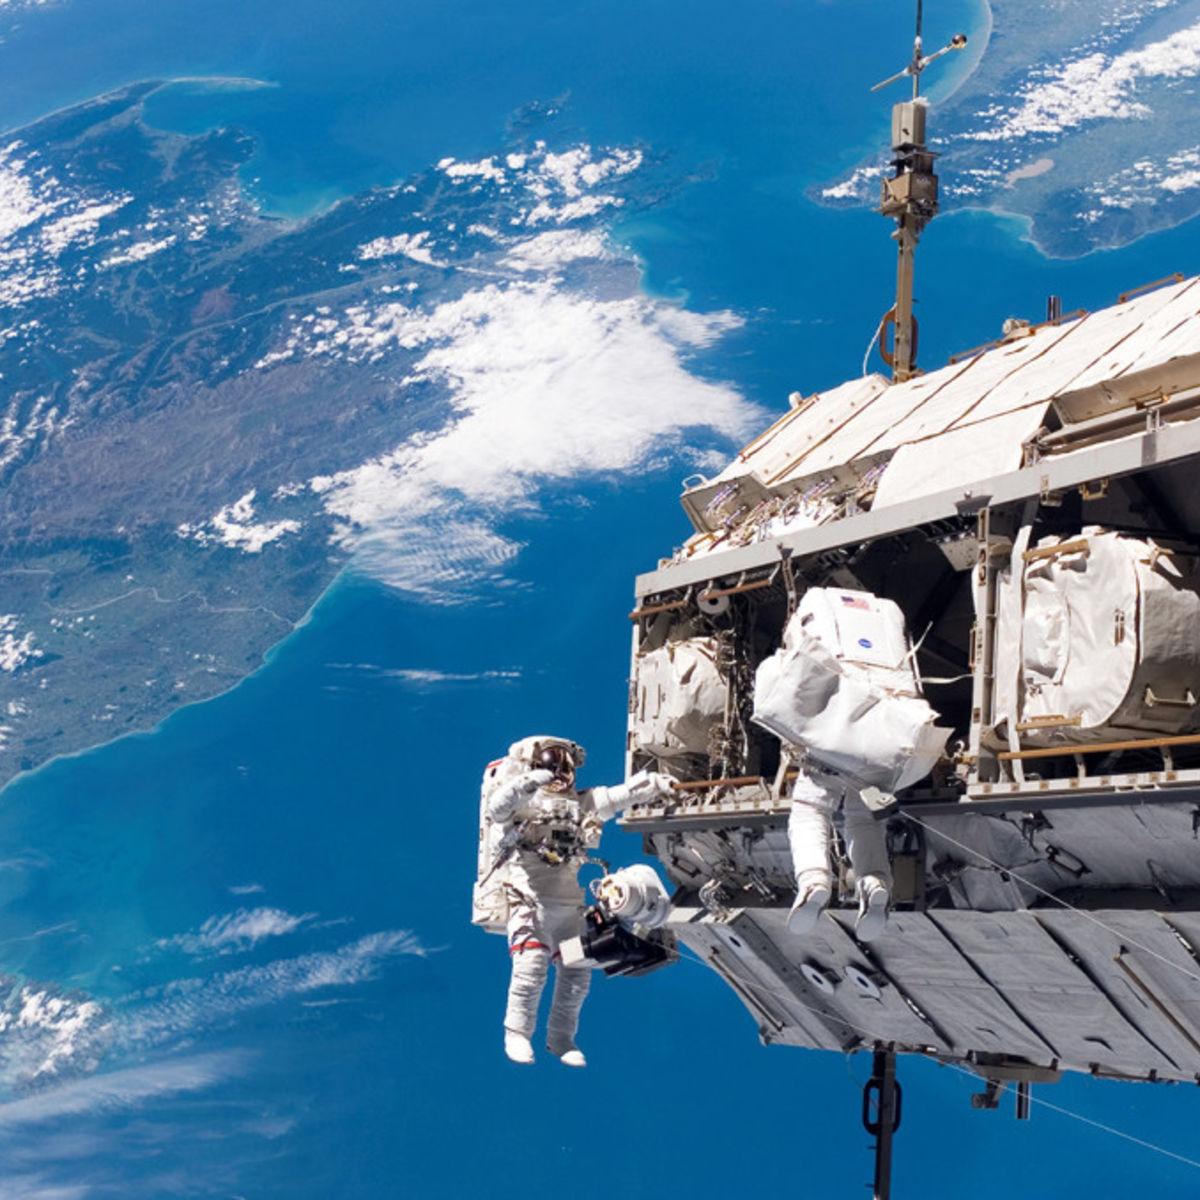 Nasa_Spacewalking_03-1024x678.jpg